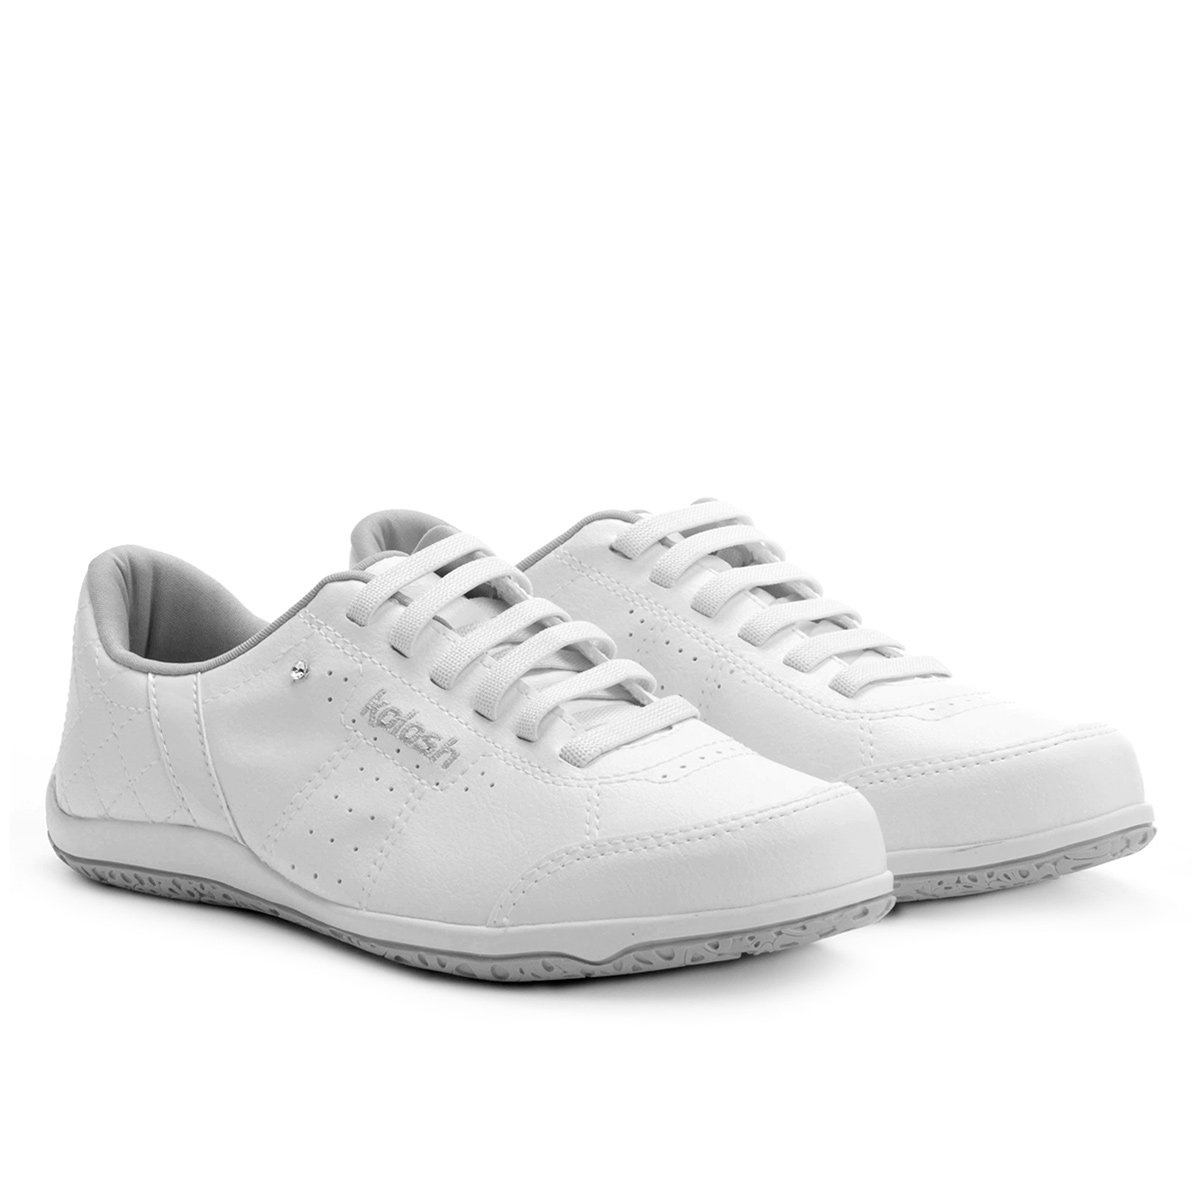 2bca9023cc7 Tênis kolosh matelassê feminino branco compre agora netshoes jpg 544x544 Tenis  feminino kolosh